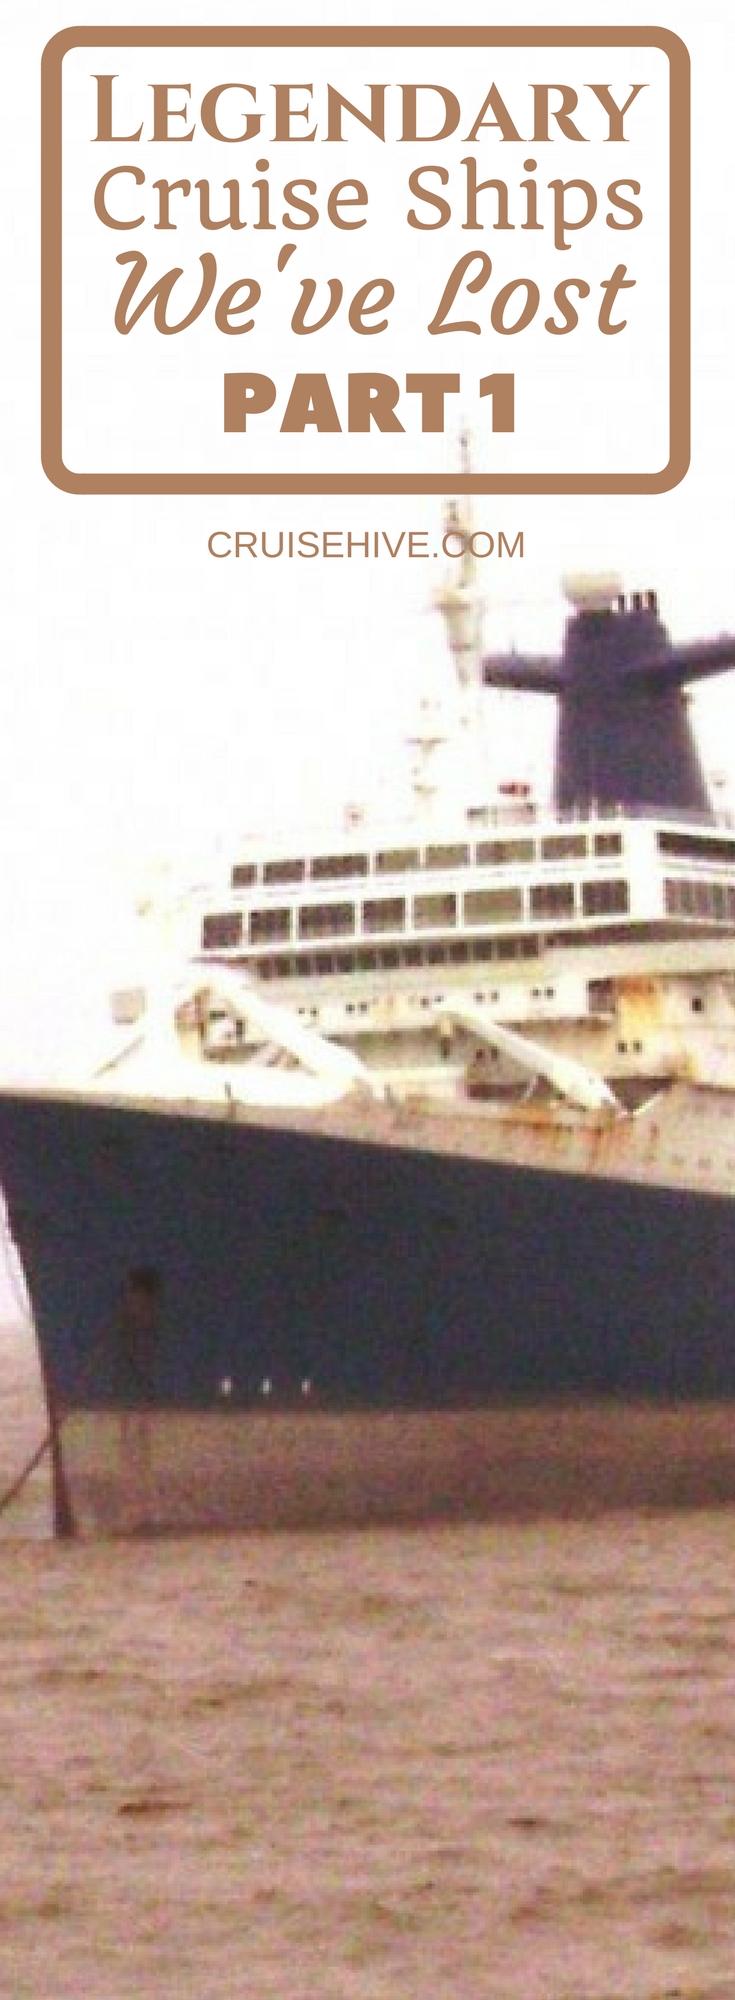 SS France Cruise Ship